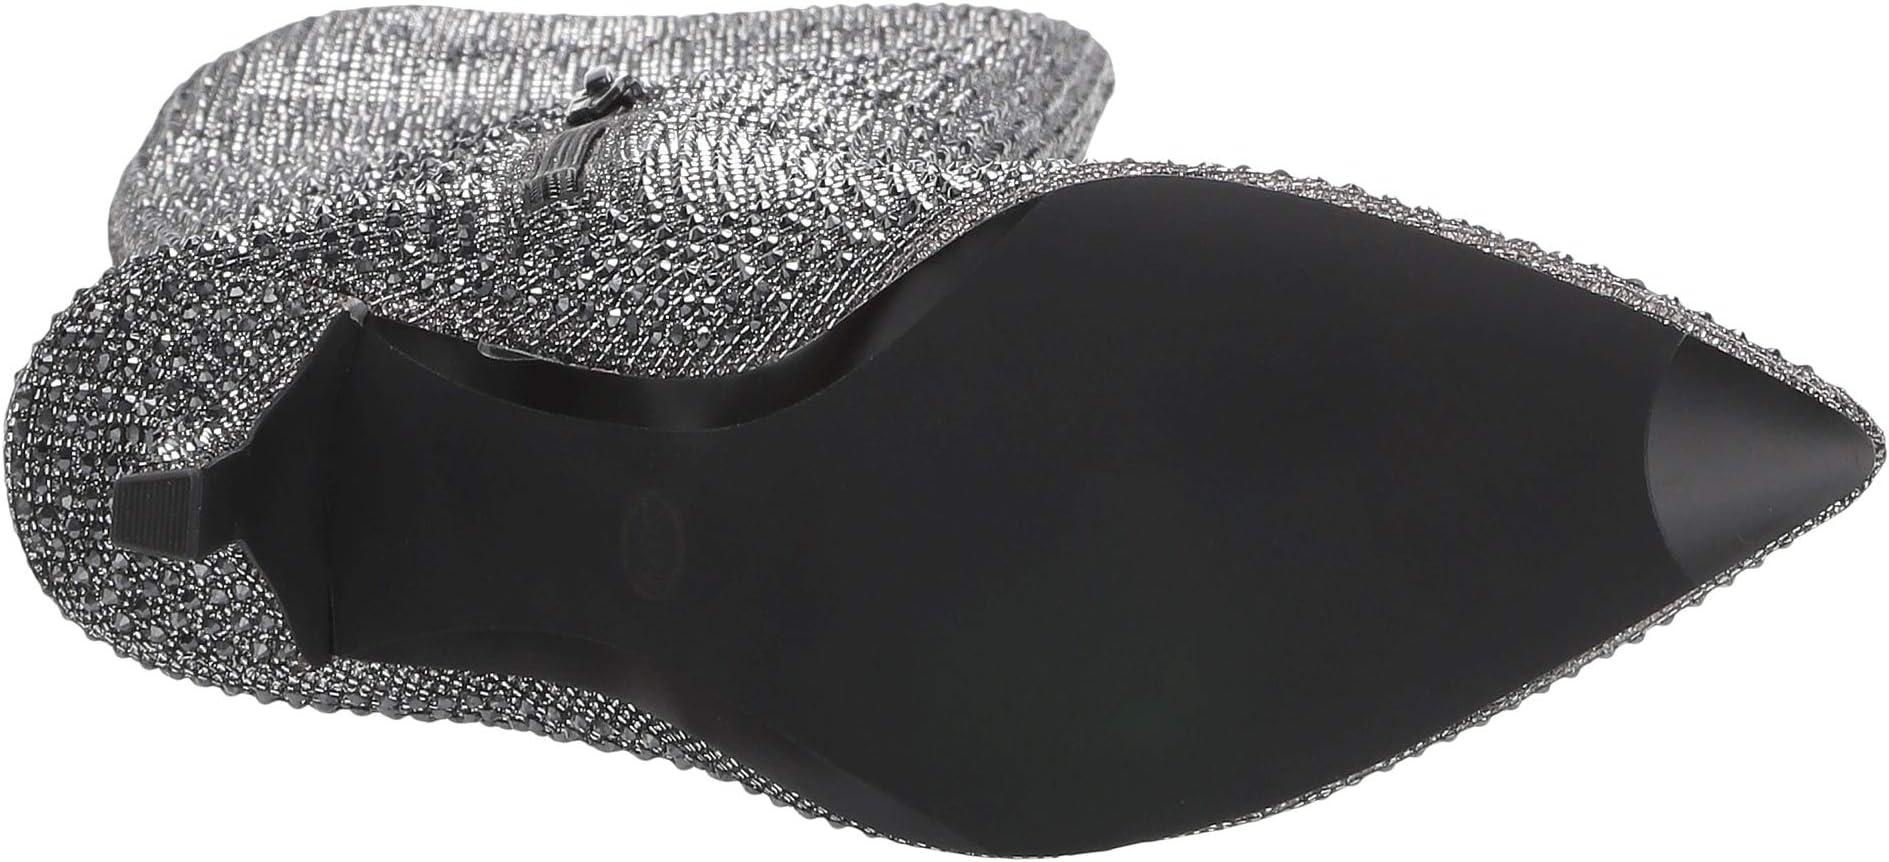 MICHAEL Michael Kors Katerina Boot | Women's shoes | 2020 Newest